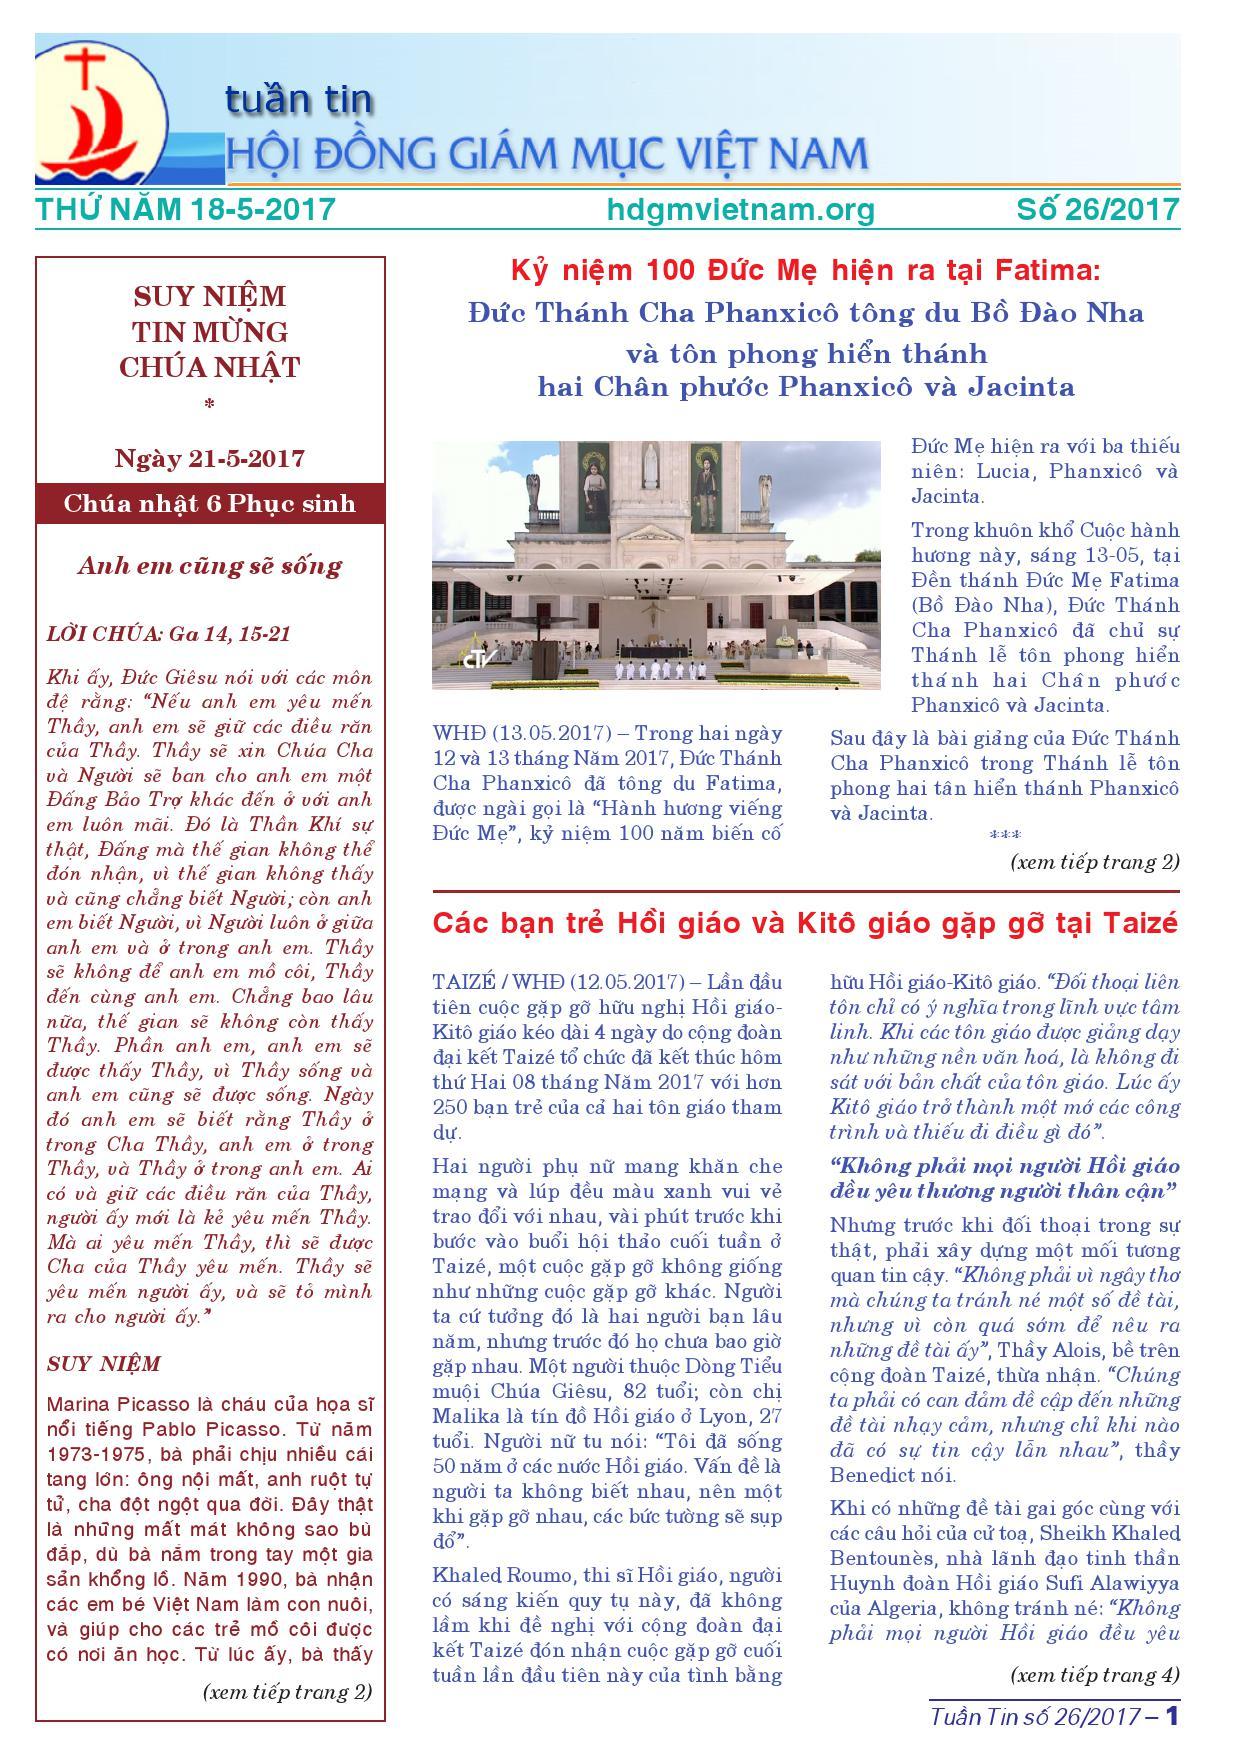 Tuần tin HĐGMVN số 26/2017